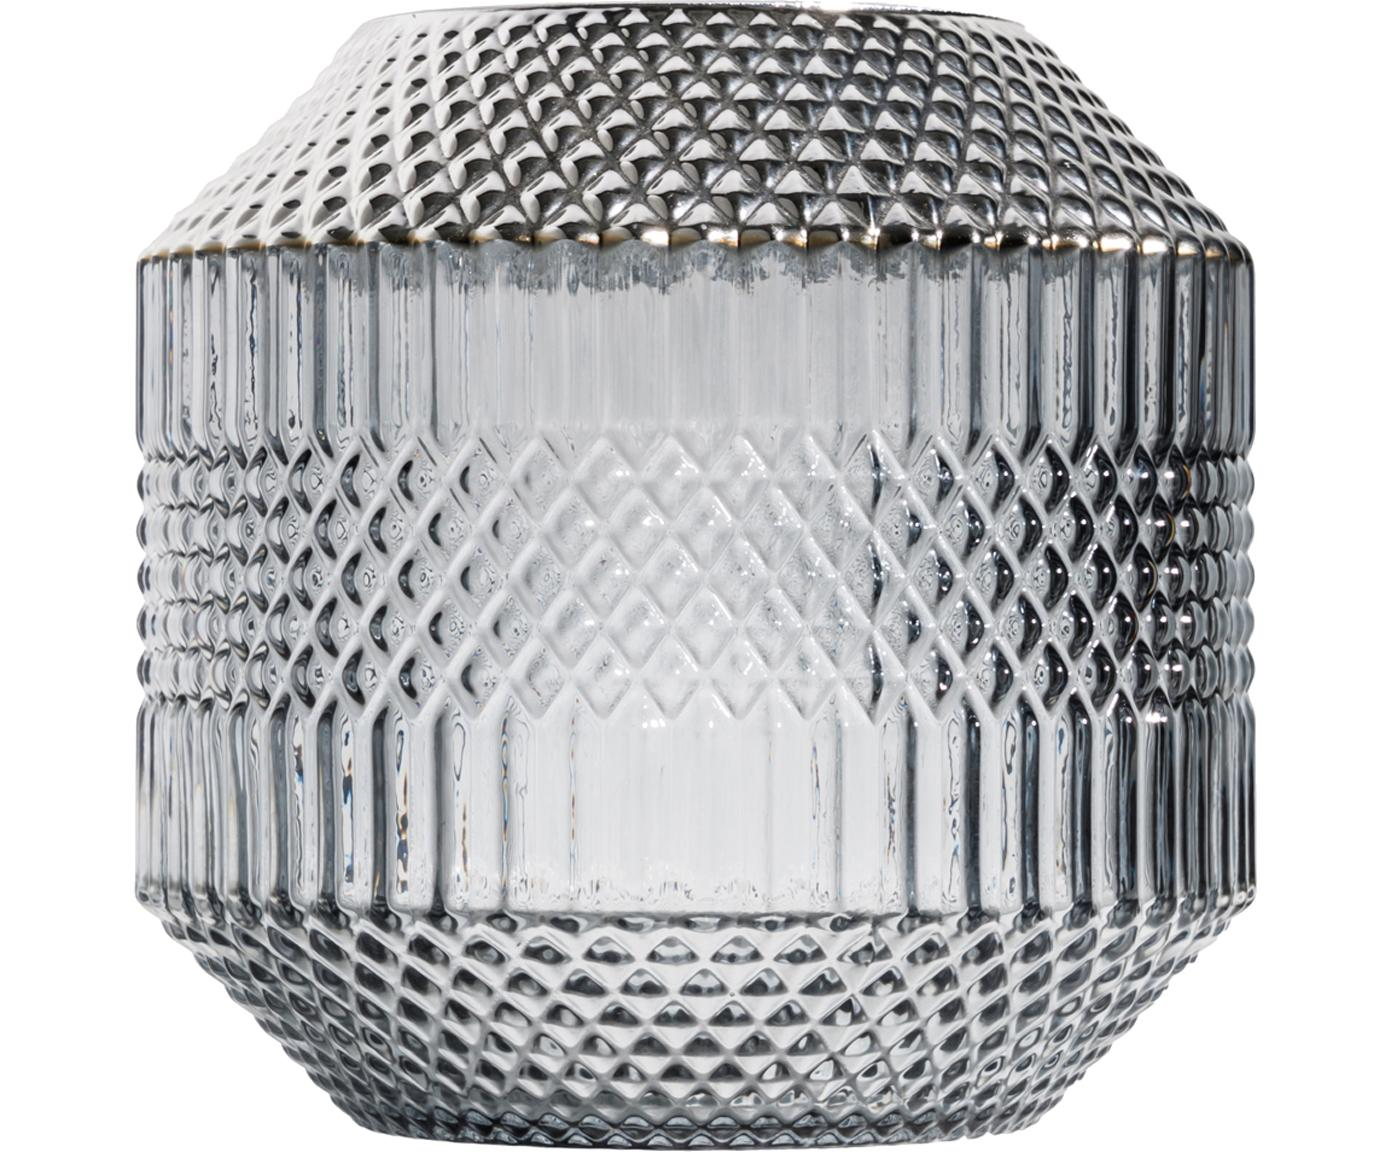 Glas-Vase Dolin, Glas, Metall, Grau, transparent, Silberfarben, Ø 20 x H 20 cm